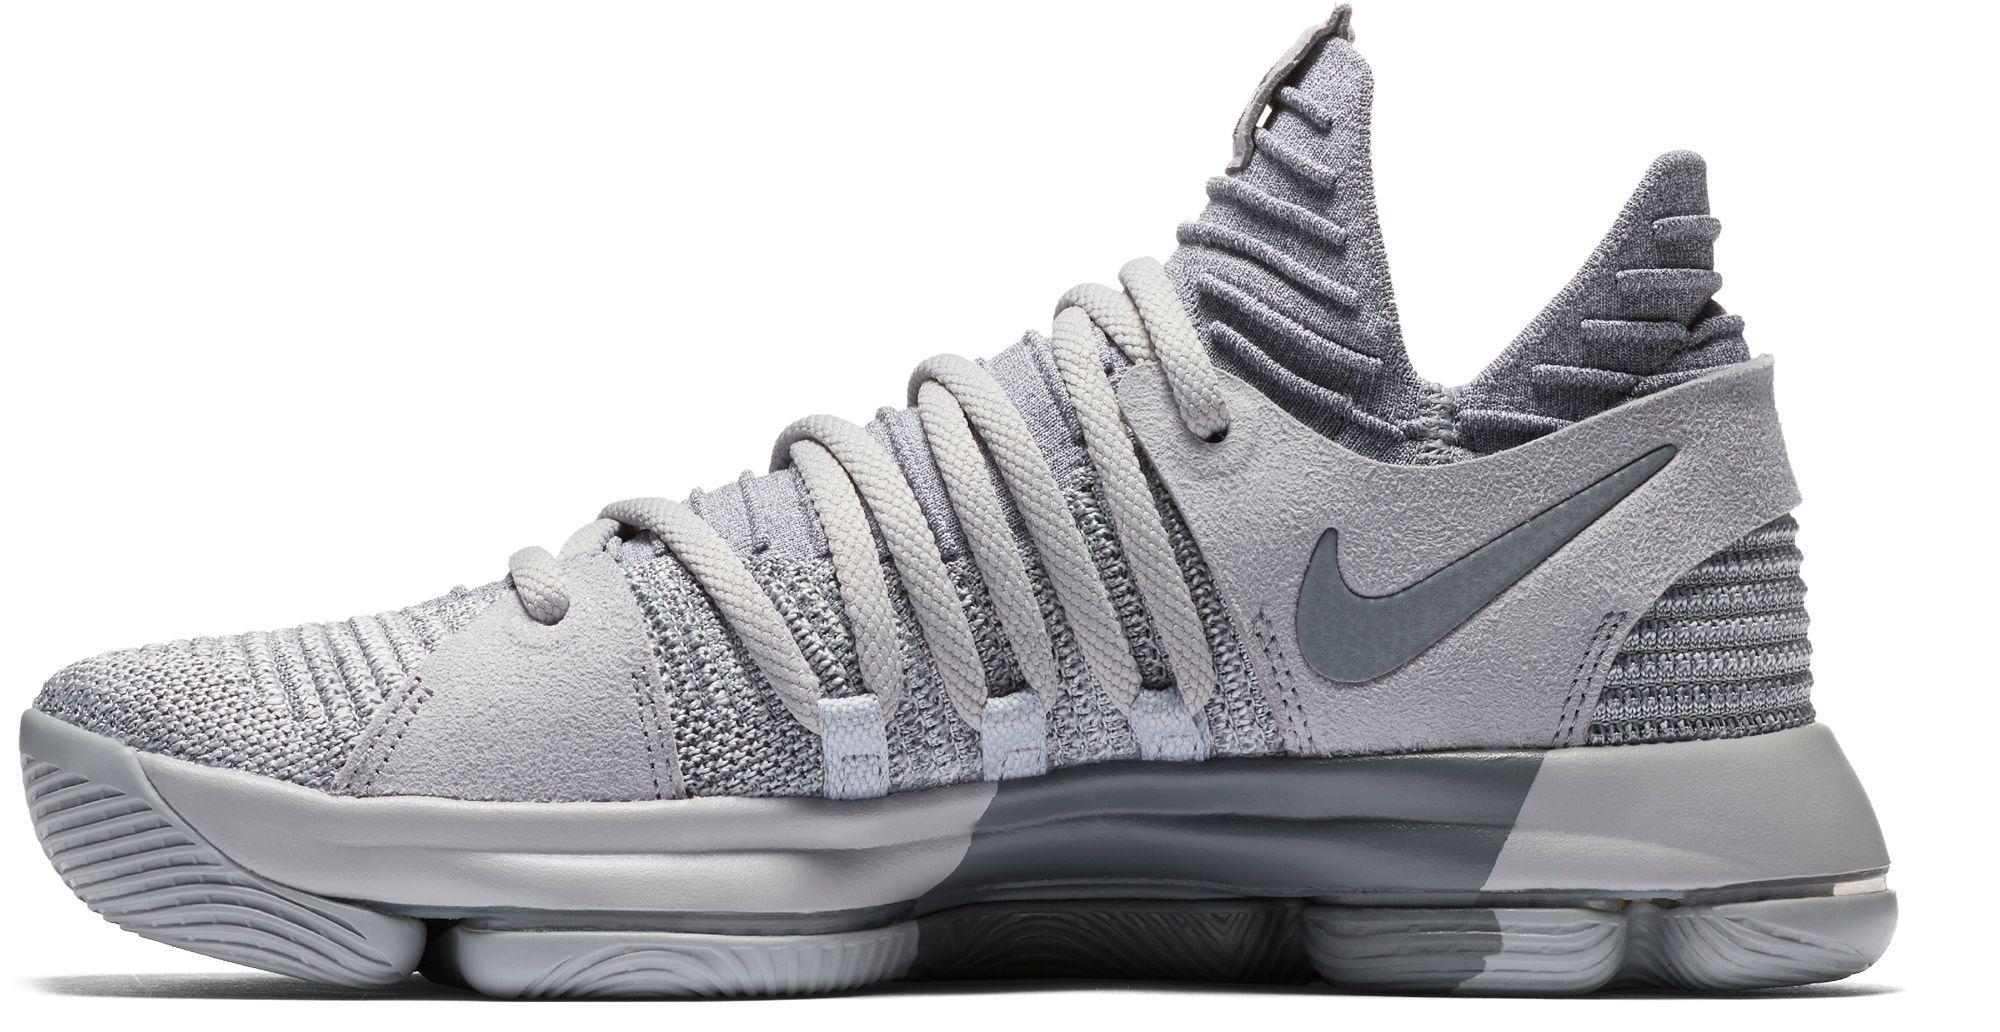 free shipping a2149 016ea Nike Gray Zoom Kd 10 Basketball Shoes for men